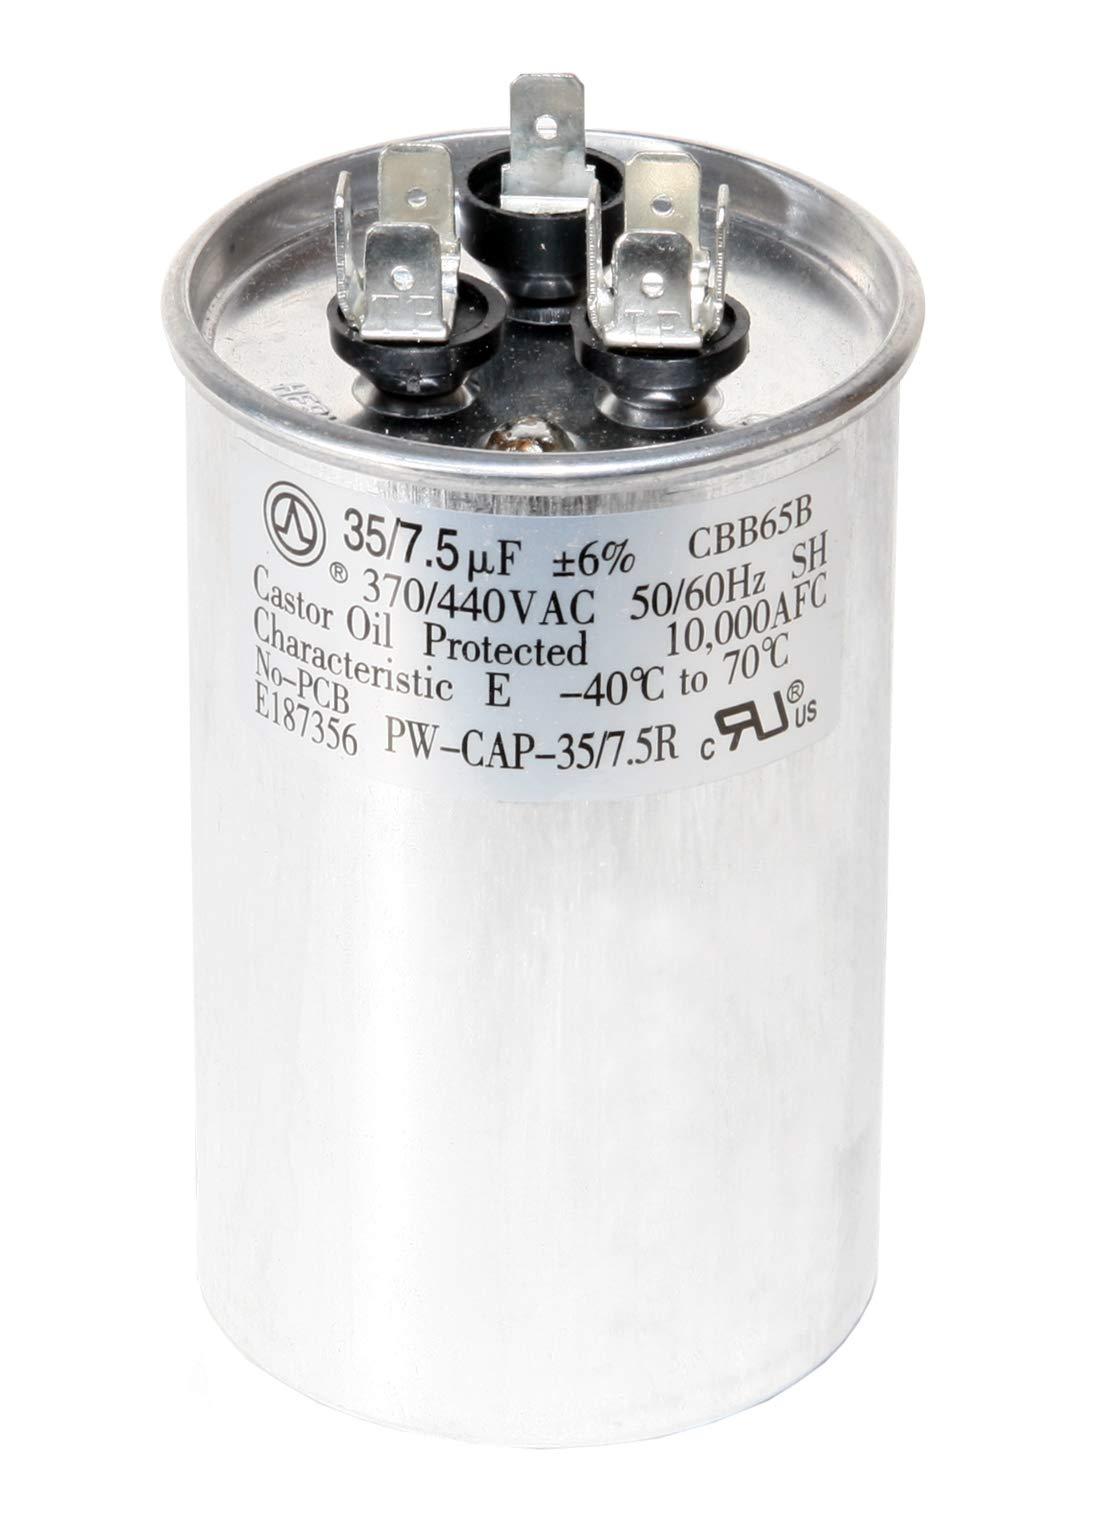 PowerWell 35+7.5 uf MFD 370 or 440 Volt Dual Run Round Capacitor Bundle PW-CAP-35/7.5/440R Condenser Straight Cool/Heat Pump Air Conditioner by PowerWell